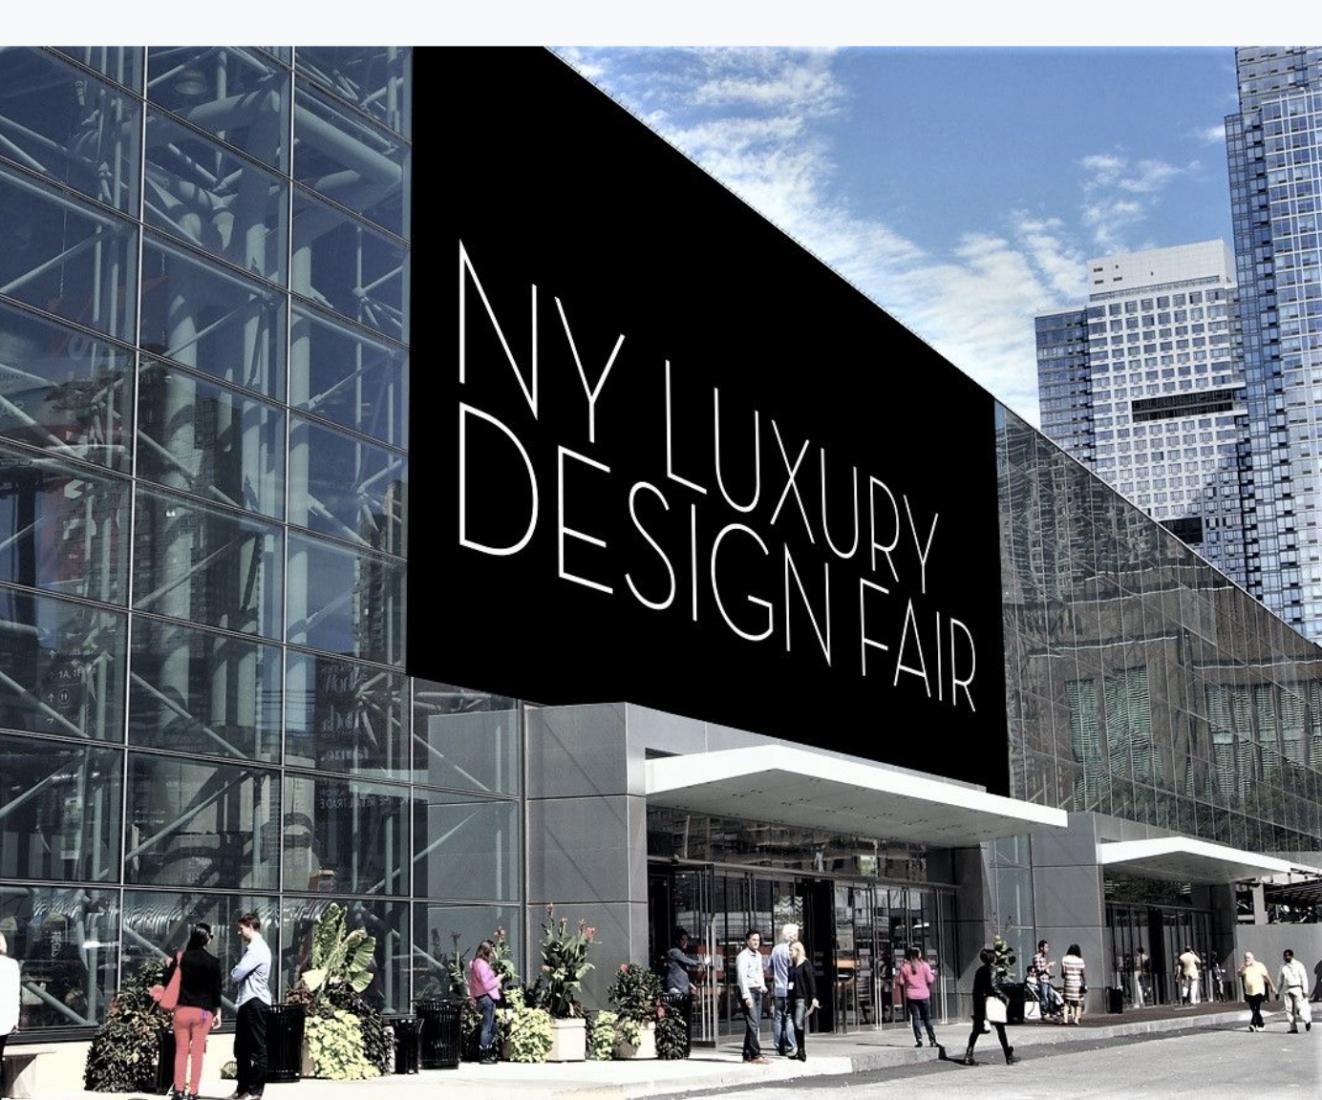 NY Luxury Design Fair To Launch September 9–12, 2021